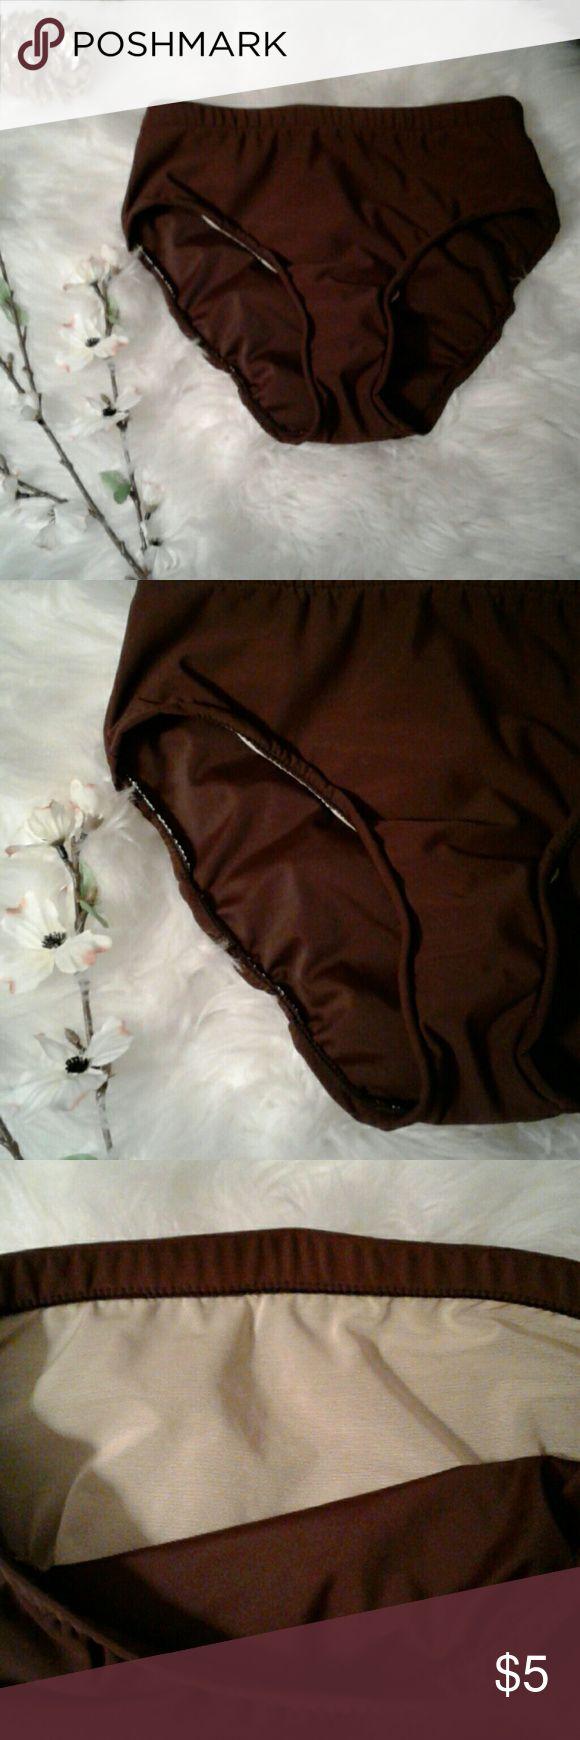 "Vtg High Waist Brown S/M Bikini Bottom Excellent condition  Sz: small/medium Stretch material Vintage high waist Waist: 12.5"" (relax laying flat) boutique Swim Bikinis"